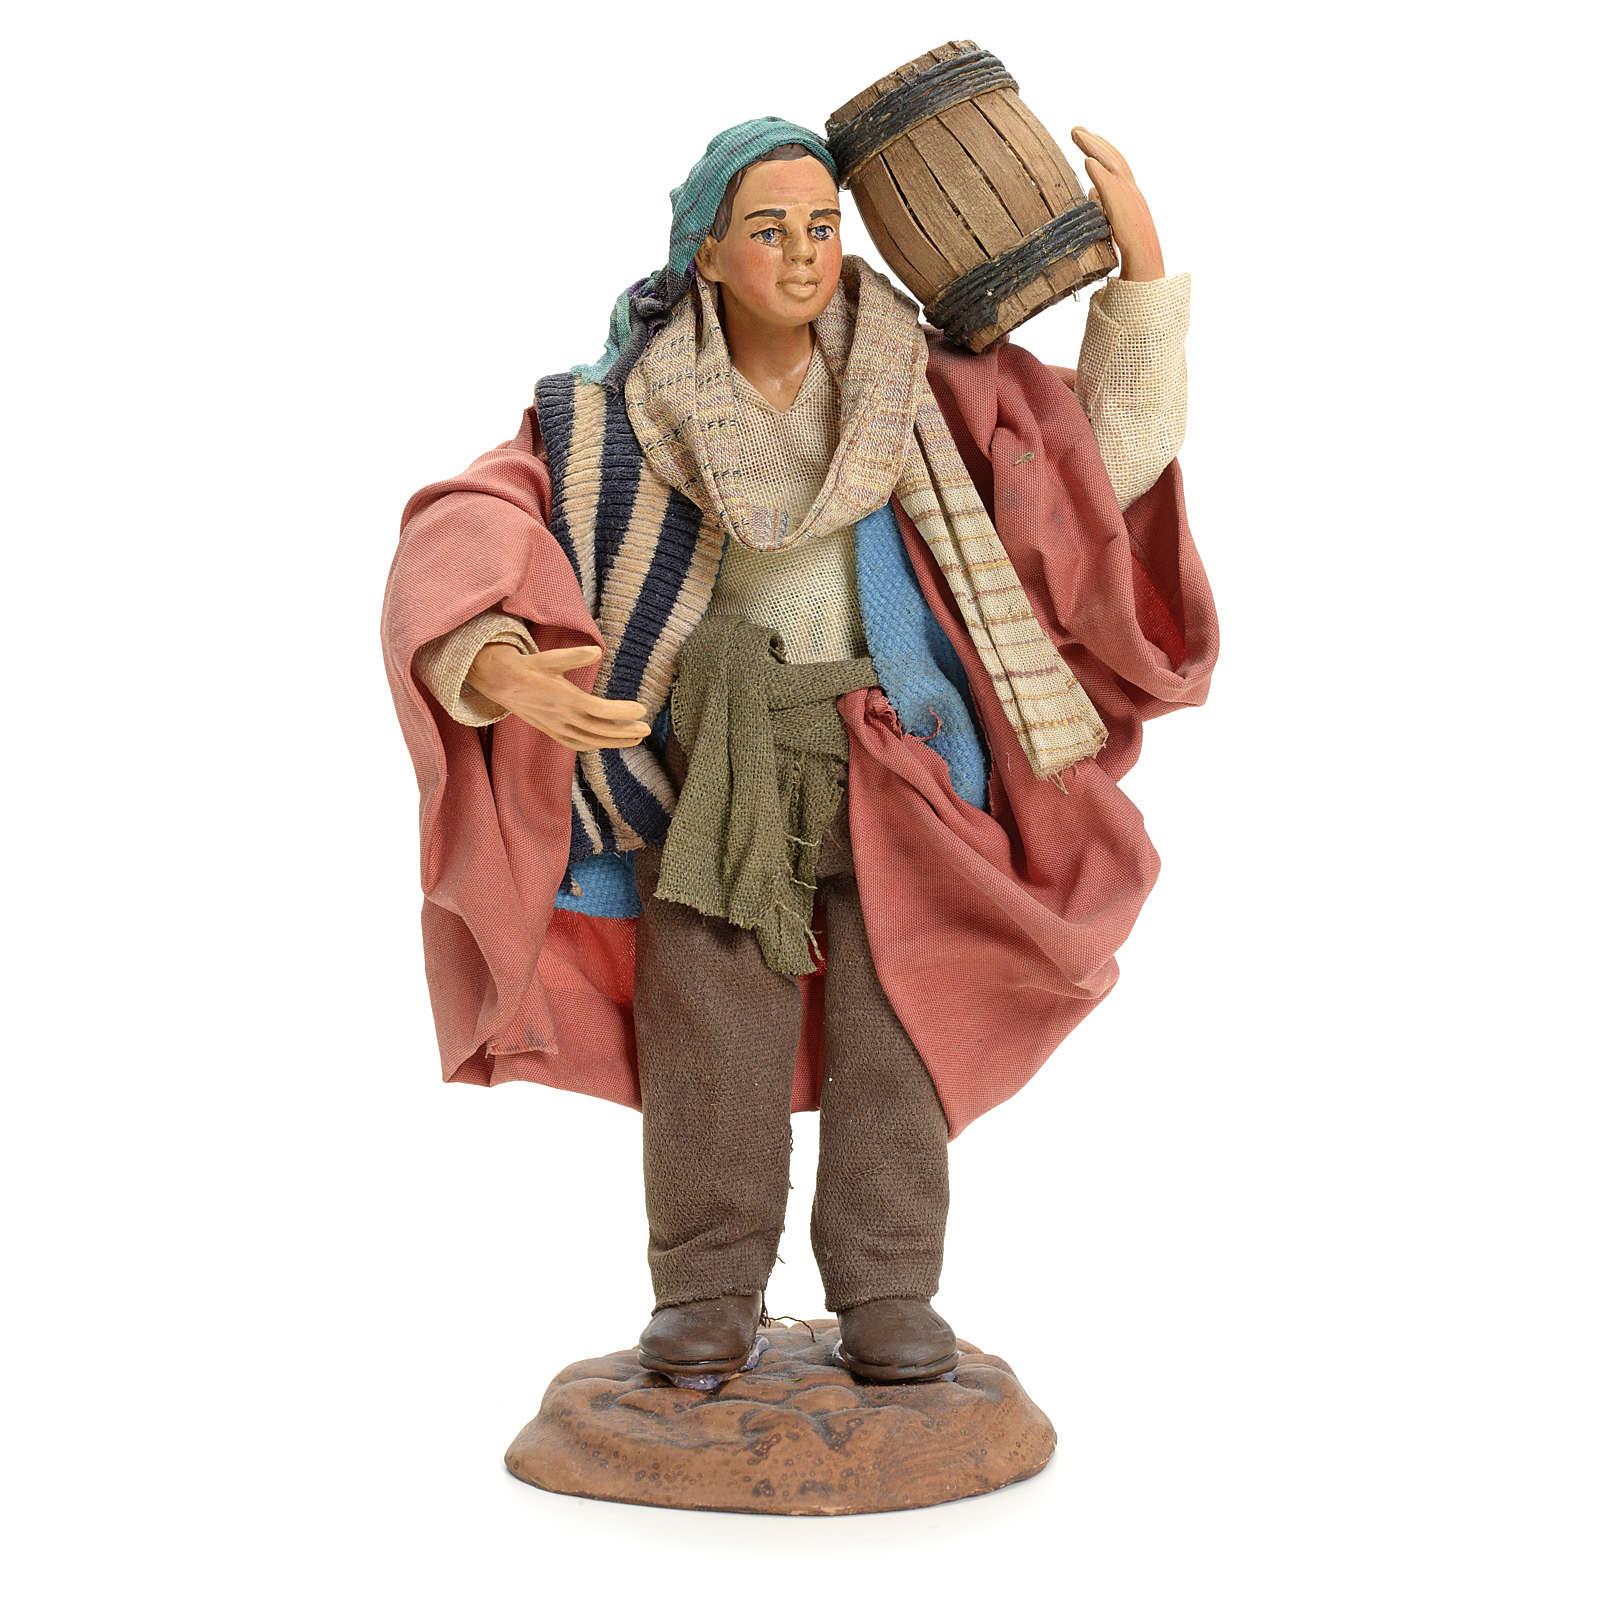 Neapolitan Nativity figurine, man carrying cask, 18 cm 4